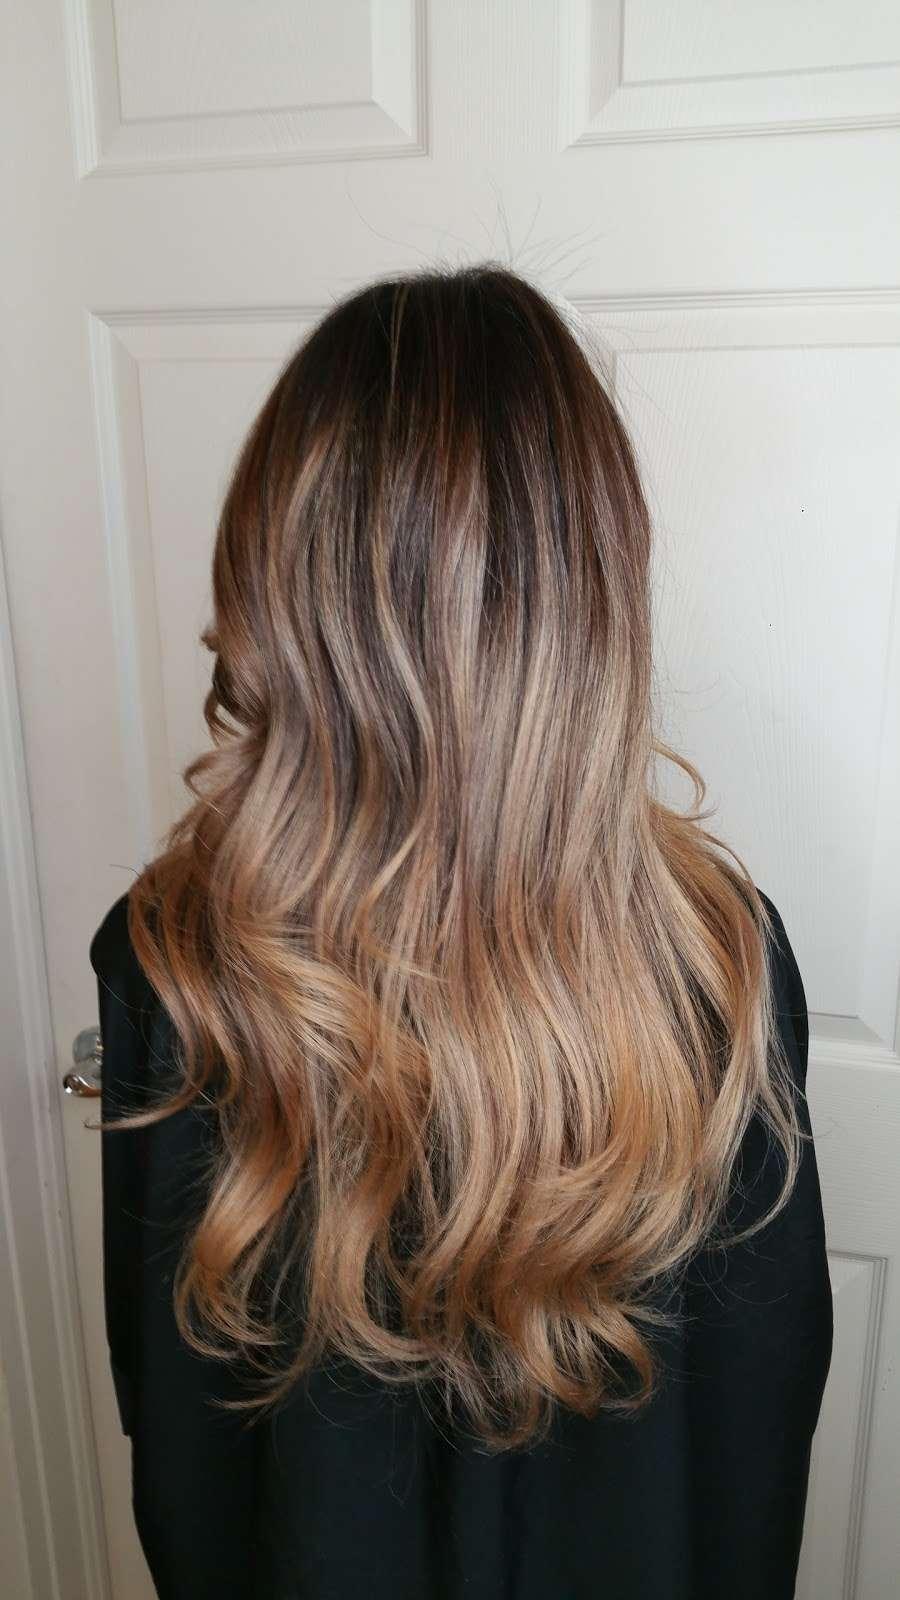 Hair Ambassadors - hair care  | Photo 1 of 3 | Address: 1144 Crenshaw Rd, Pasadena, TX 77504, USA | Phone: (281) 487-6616